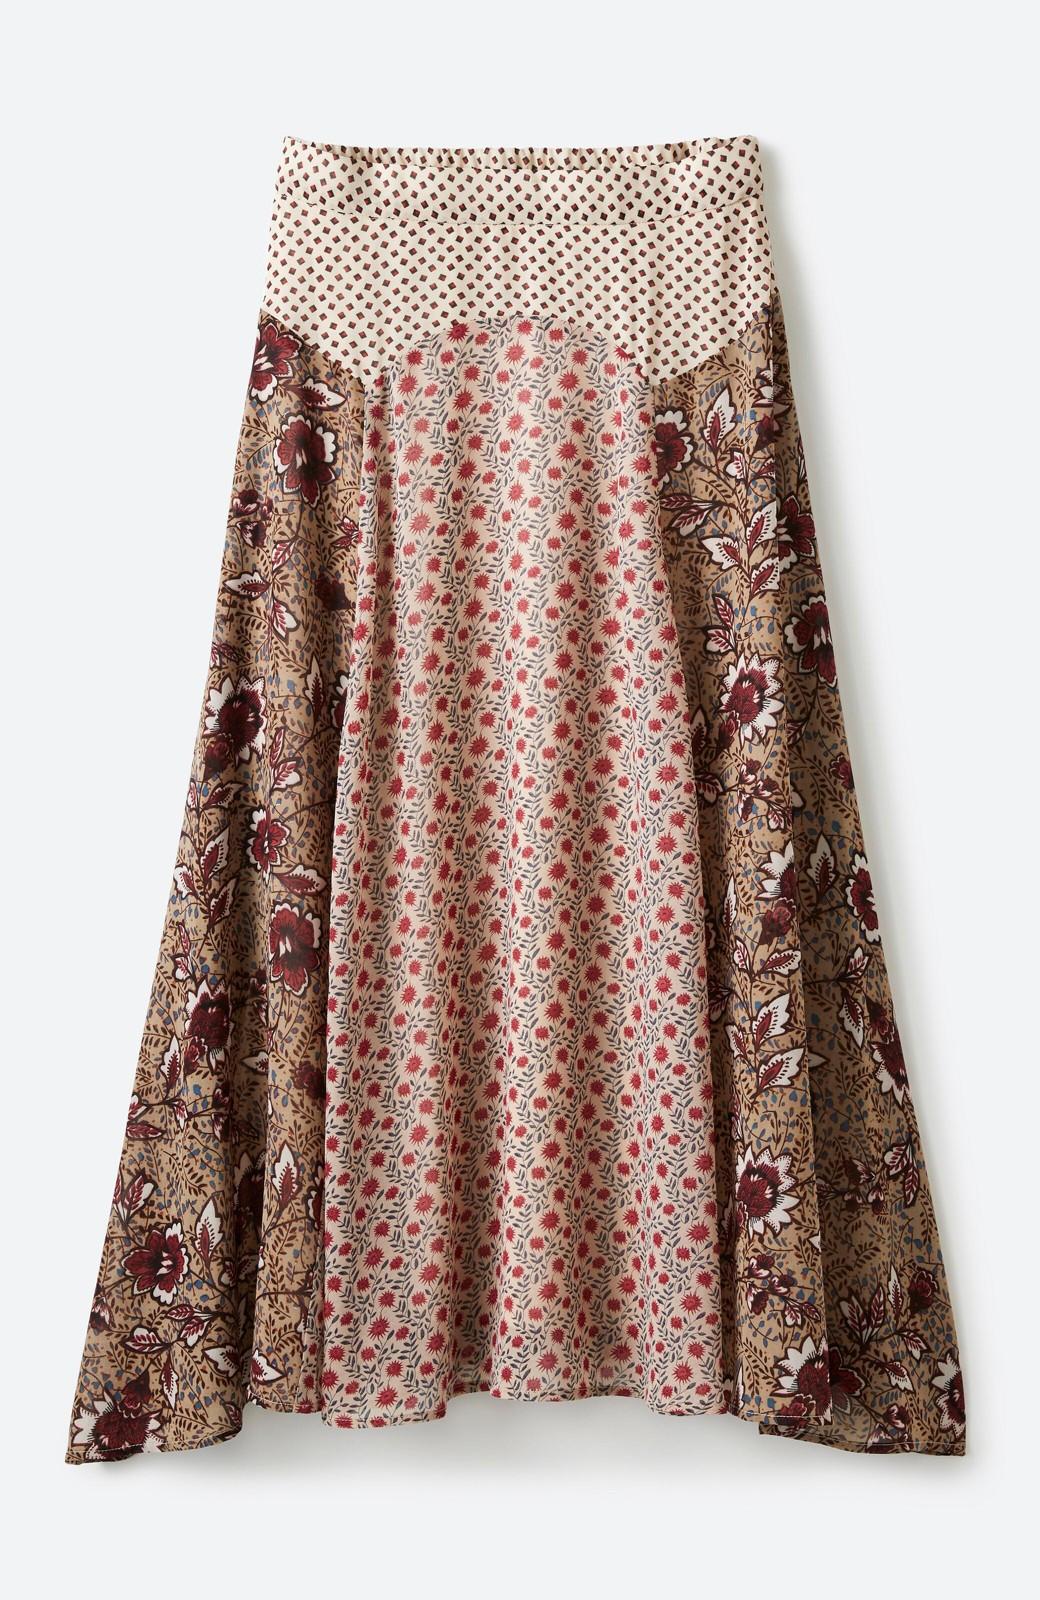 haco! 【洗濯機洗いOK】シンプルなトップスに合わせるだけでかわいくなれる MIX柄スカート <ベージュ系その他>の商品写真3